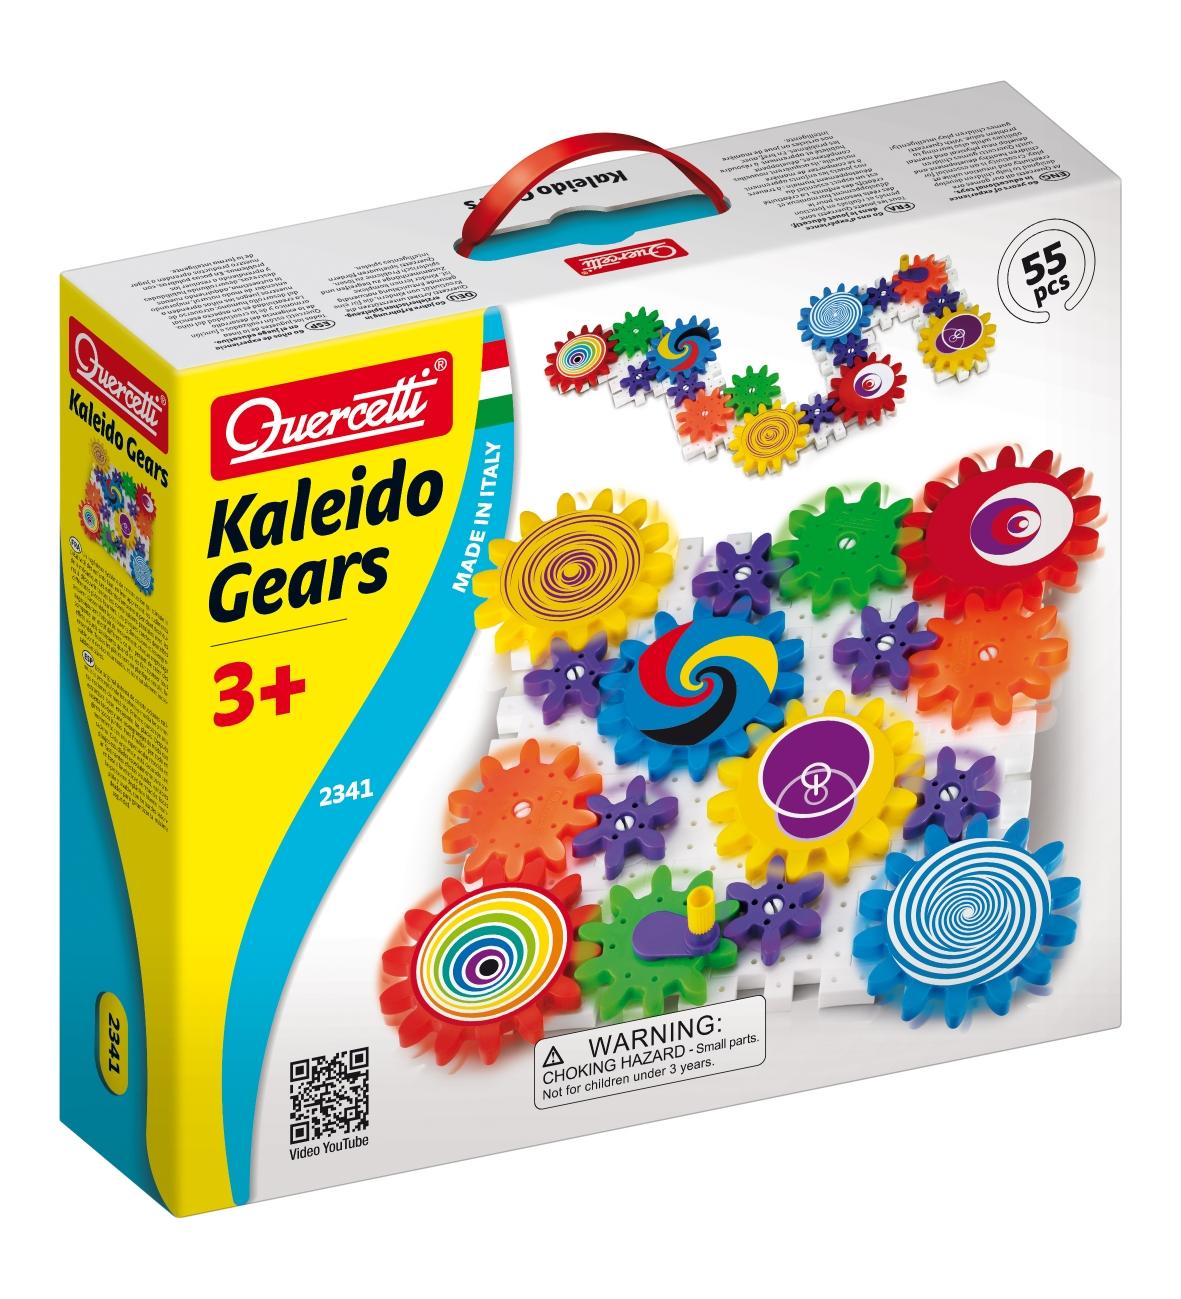 Quercetti Georello Kaleido Gears 55 ks 2341